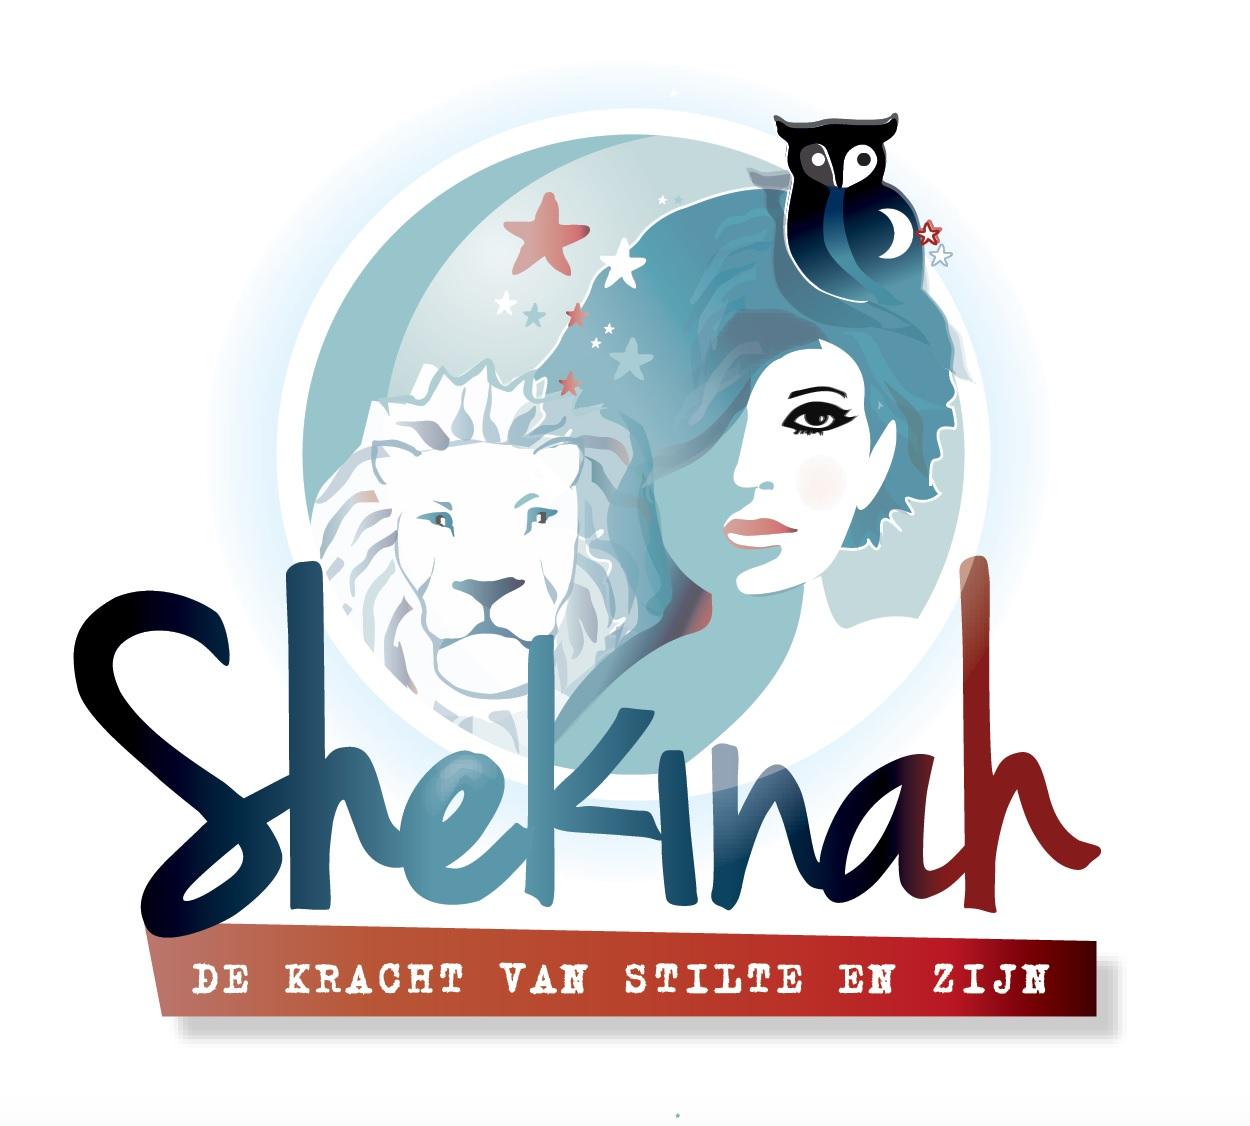 Logo Griet Geeraert - Shekinah